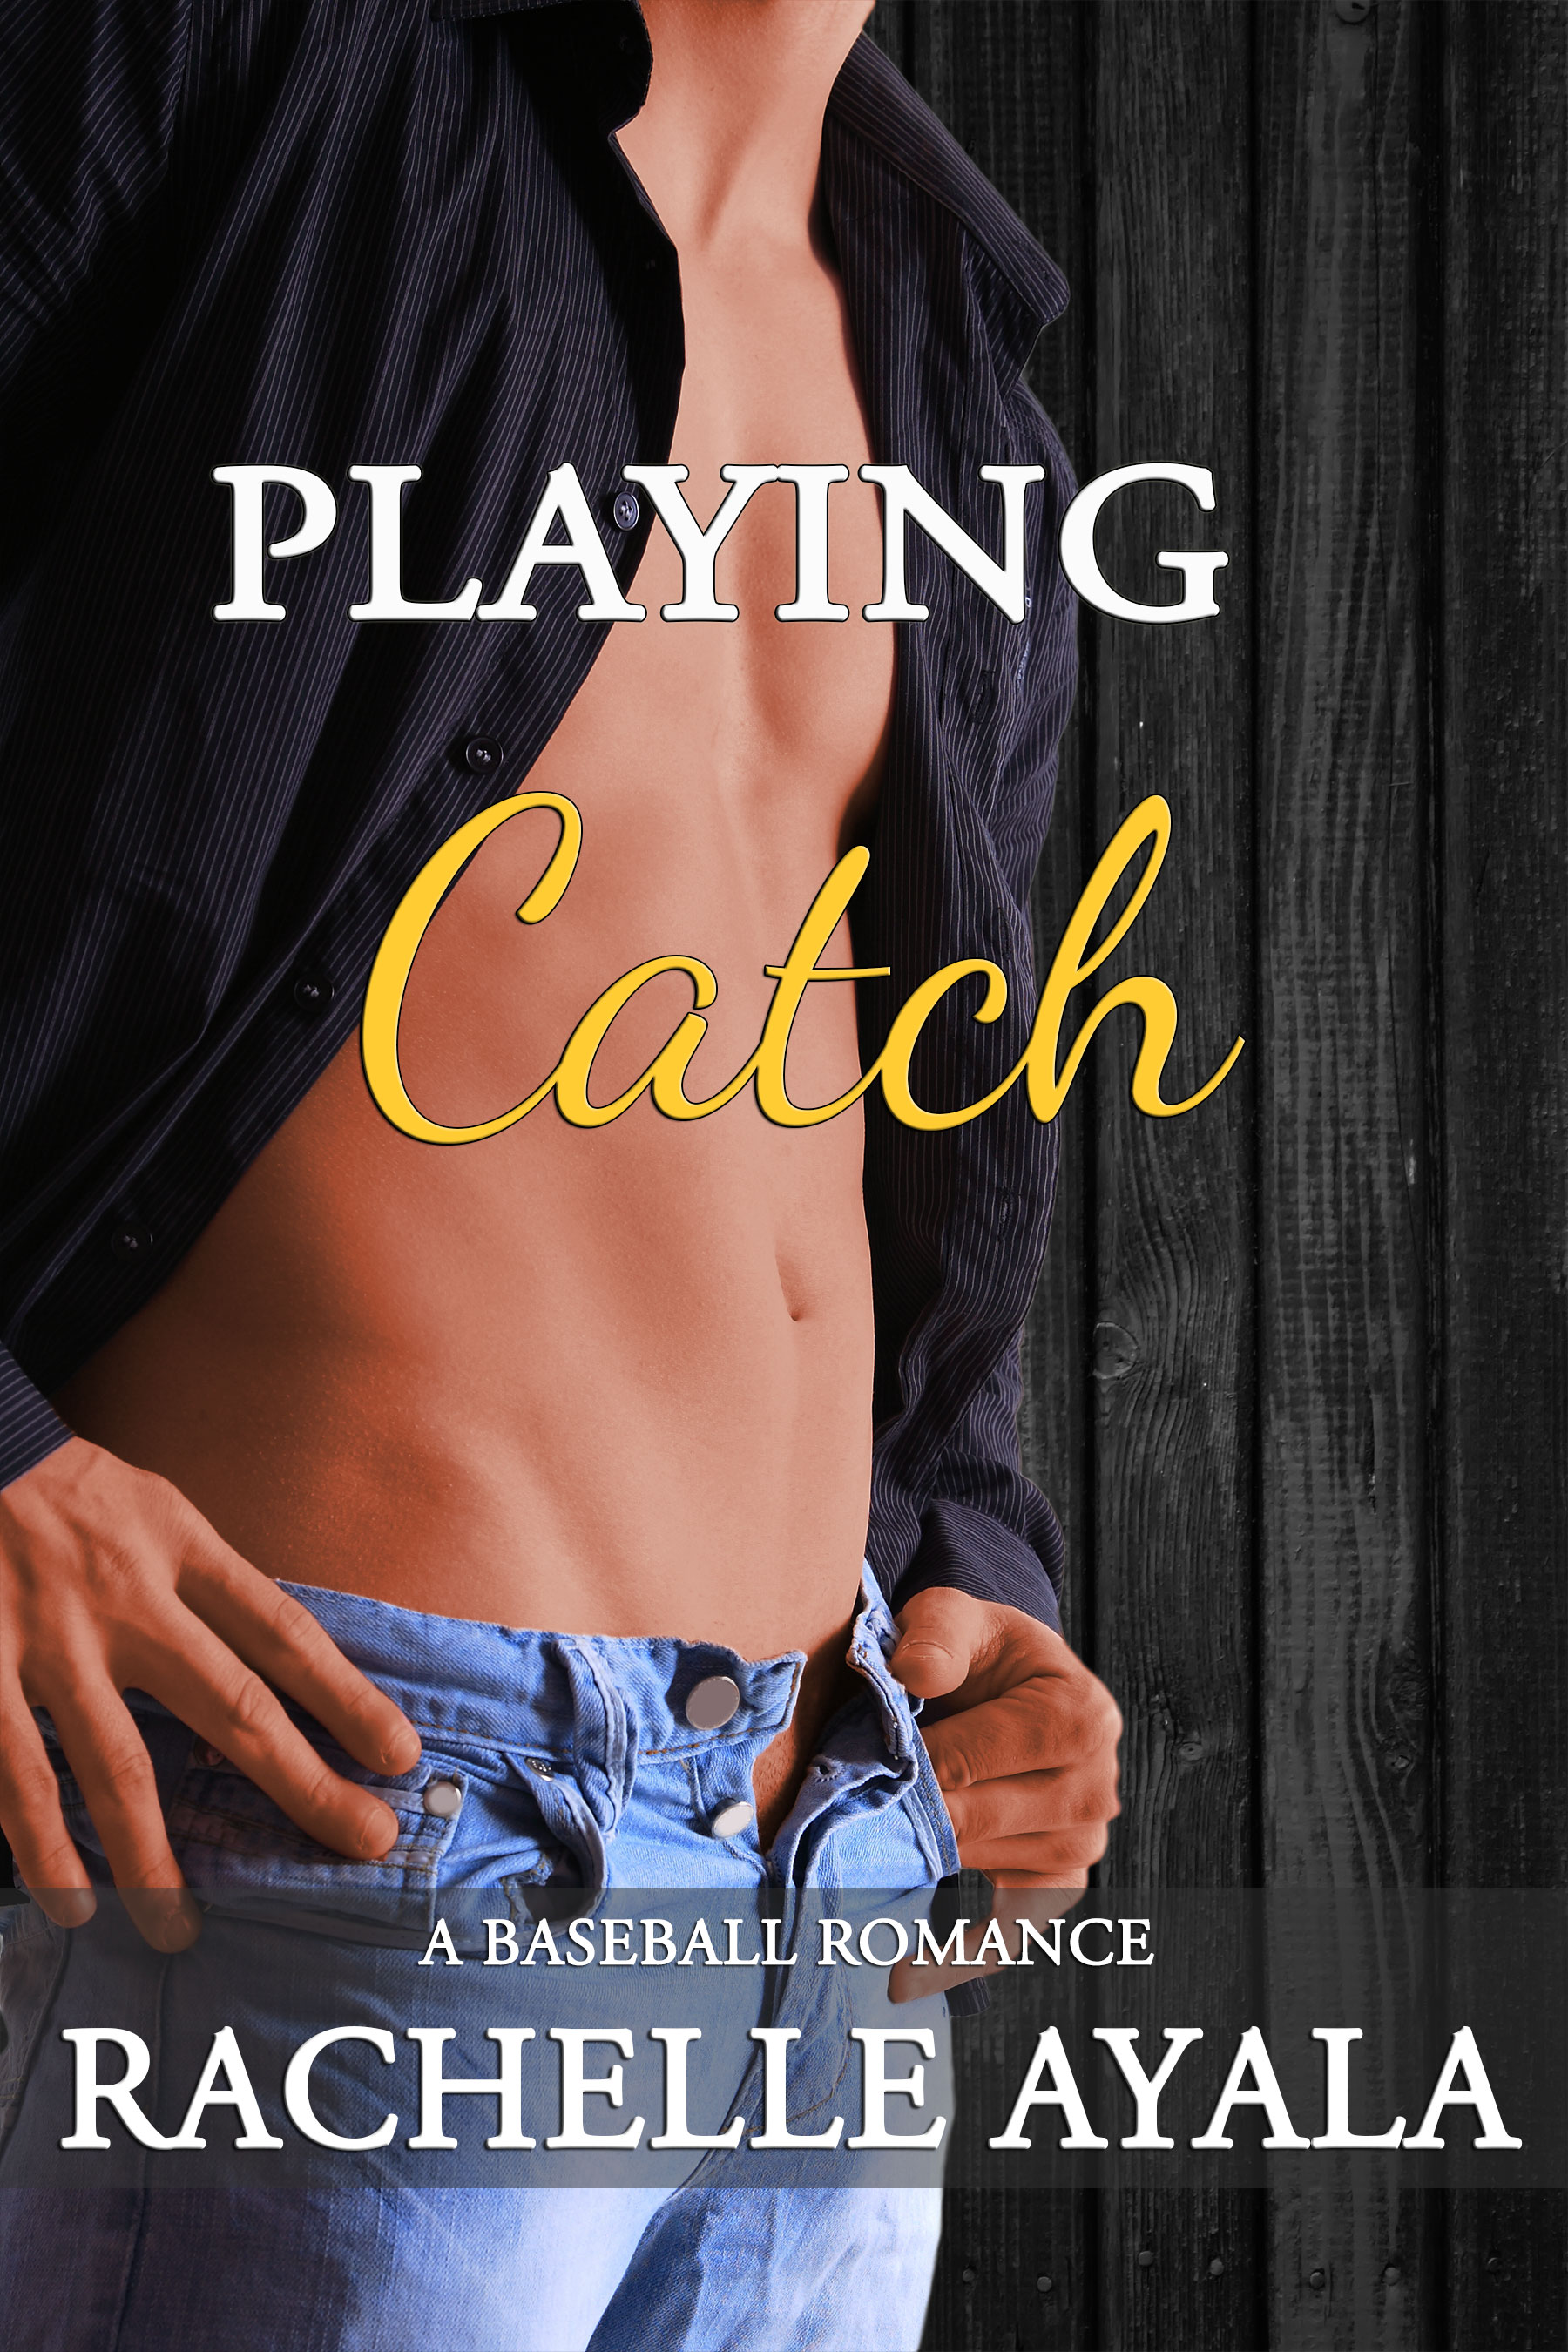 Playing catch: men of spring baseball romance